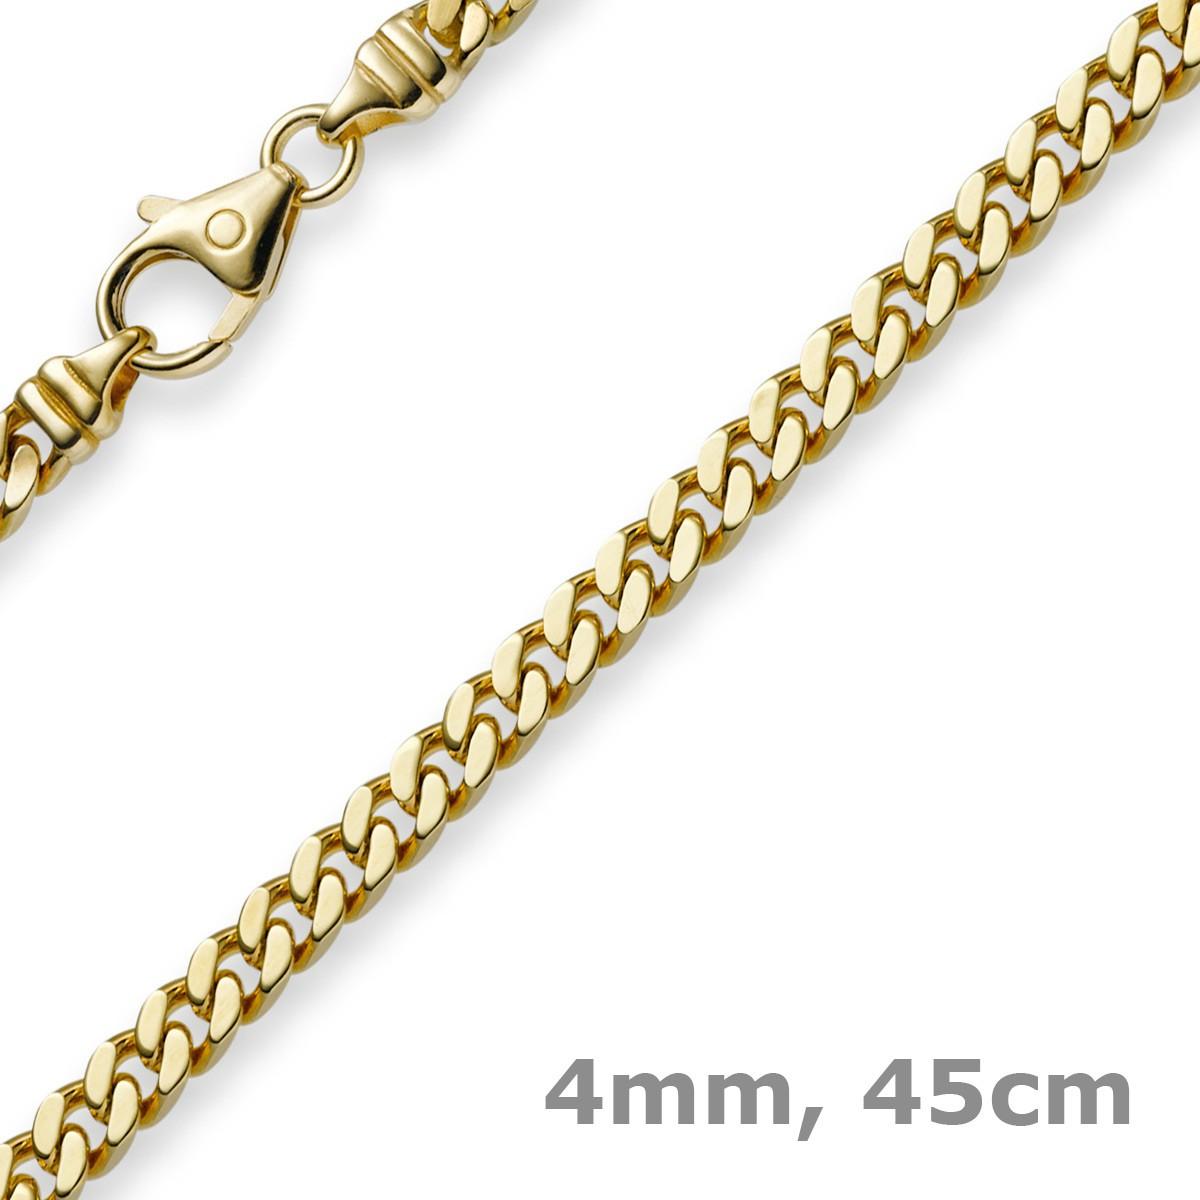 4mm panzerkette kette collier aus 585 gold gelbgold goldkette 45cm. Black Bedroom Furniture Sets. Home Design Ideas